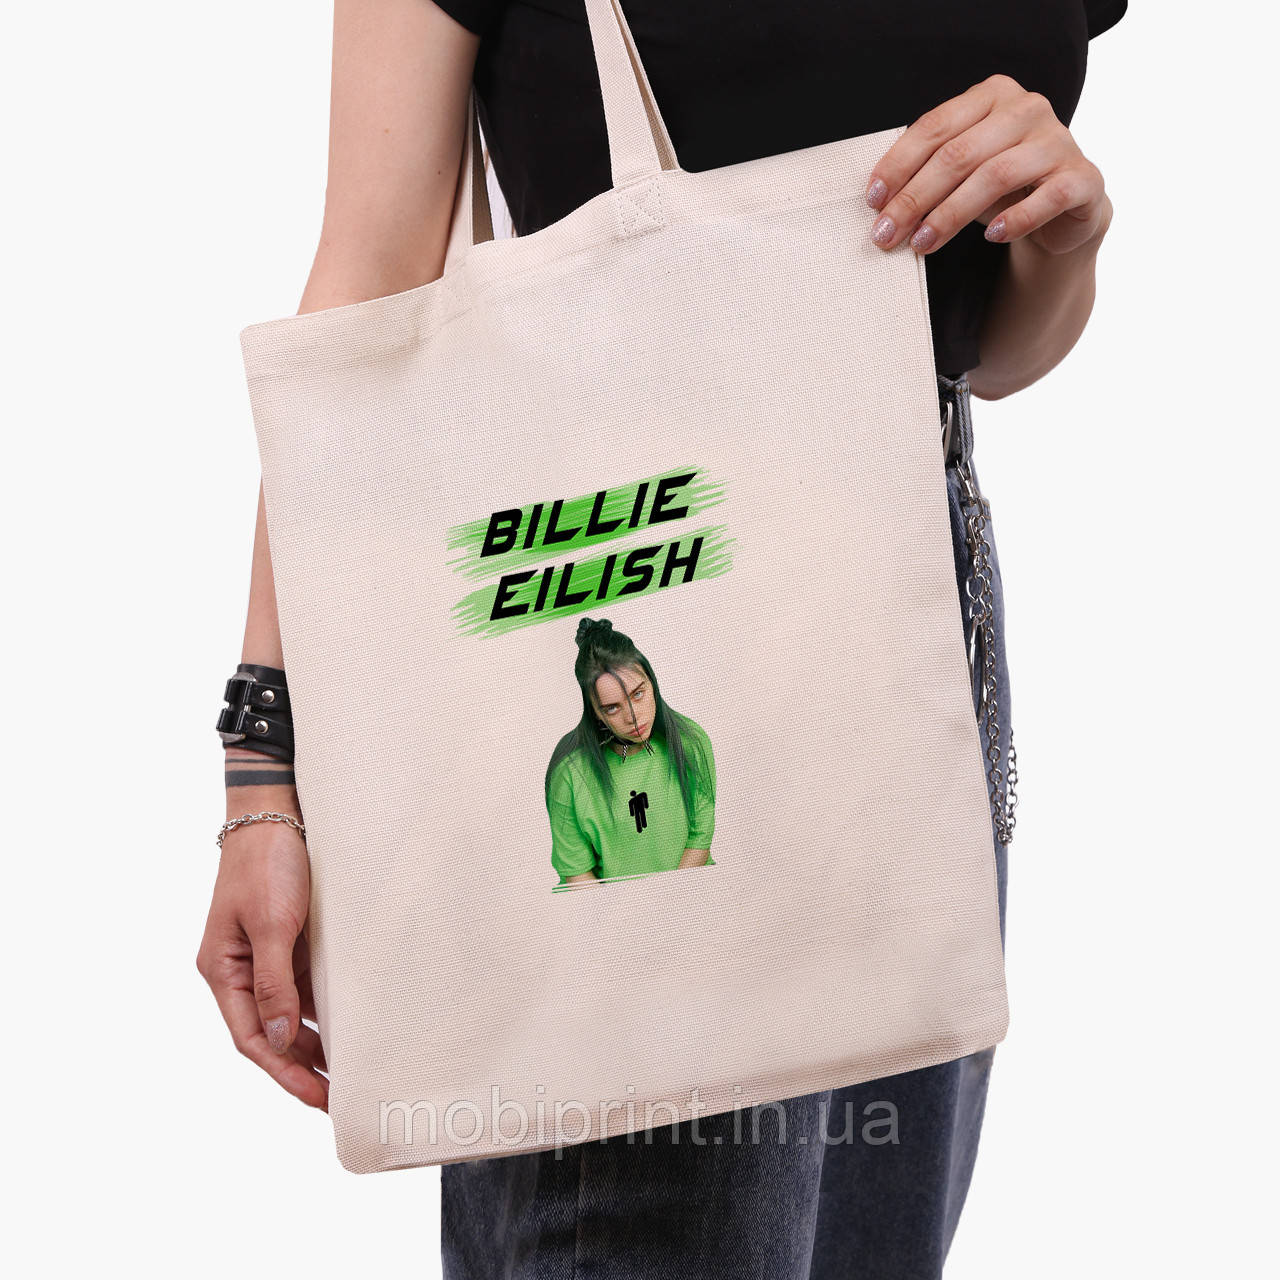 Эко сумка шоппер Билли Айлиш (Billie Eilish) (9227-1207)  экосумка шопер 41*35 см